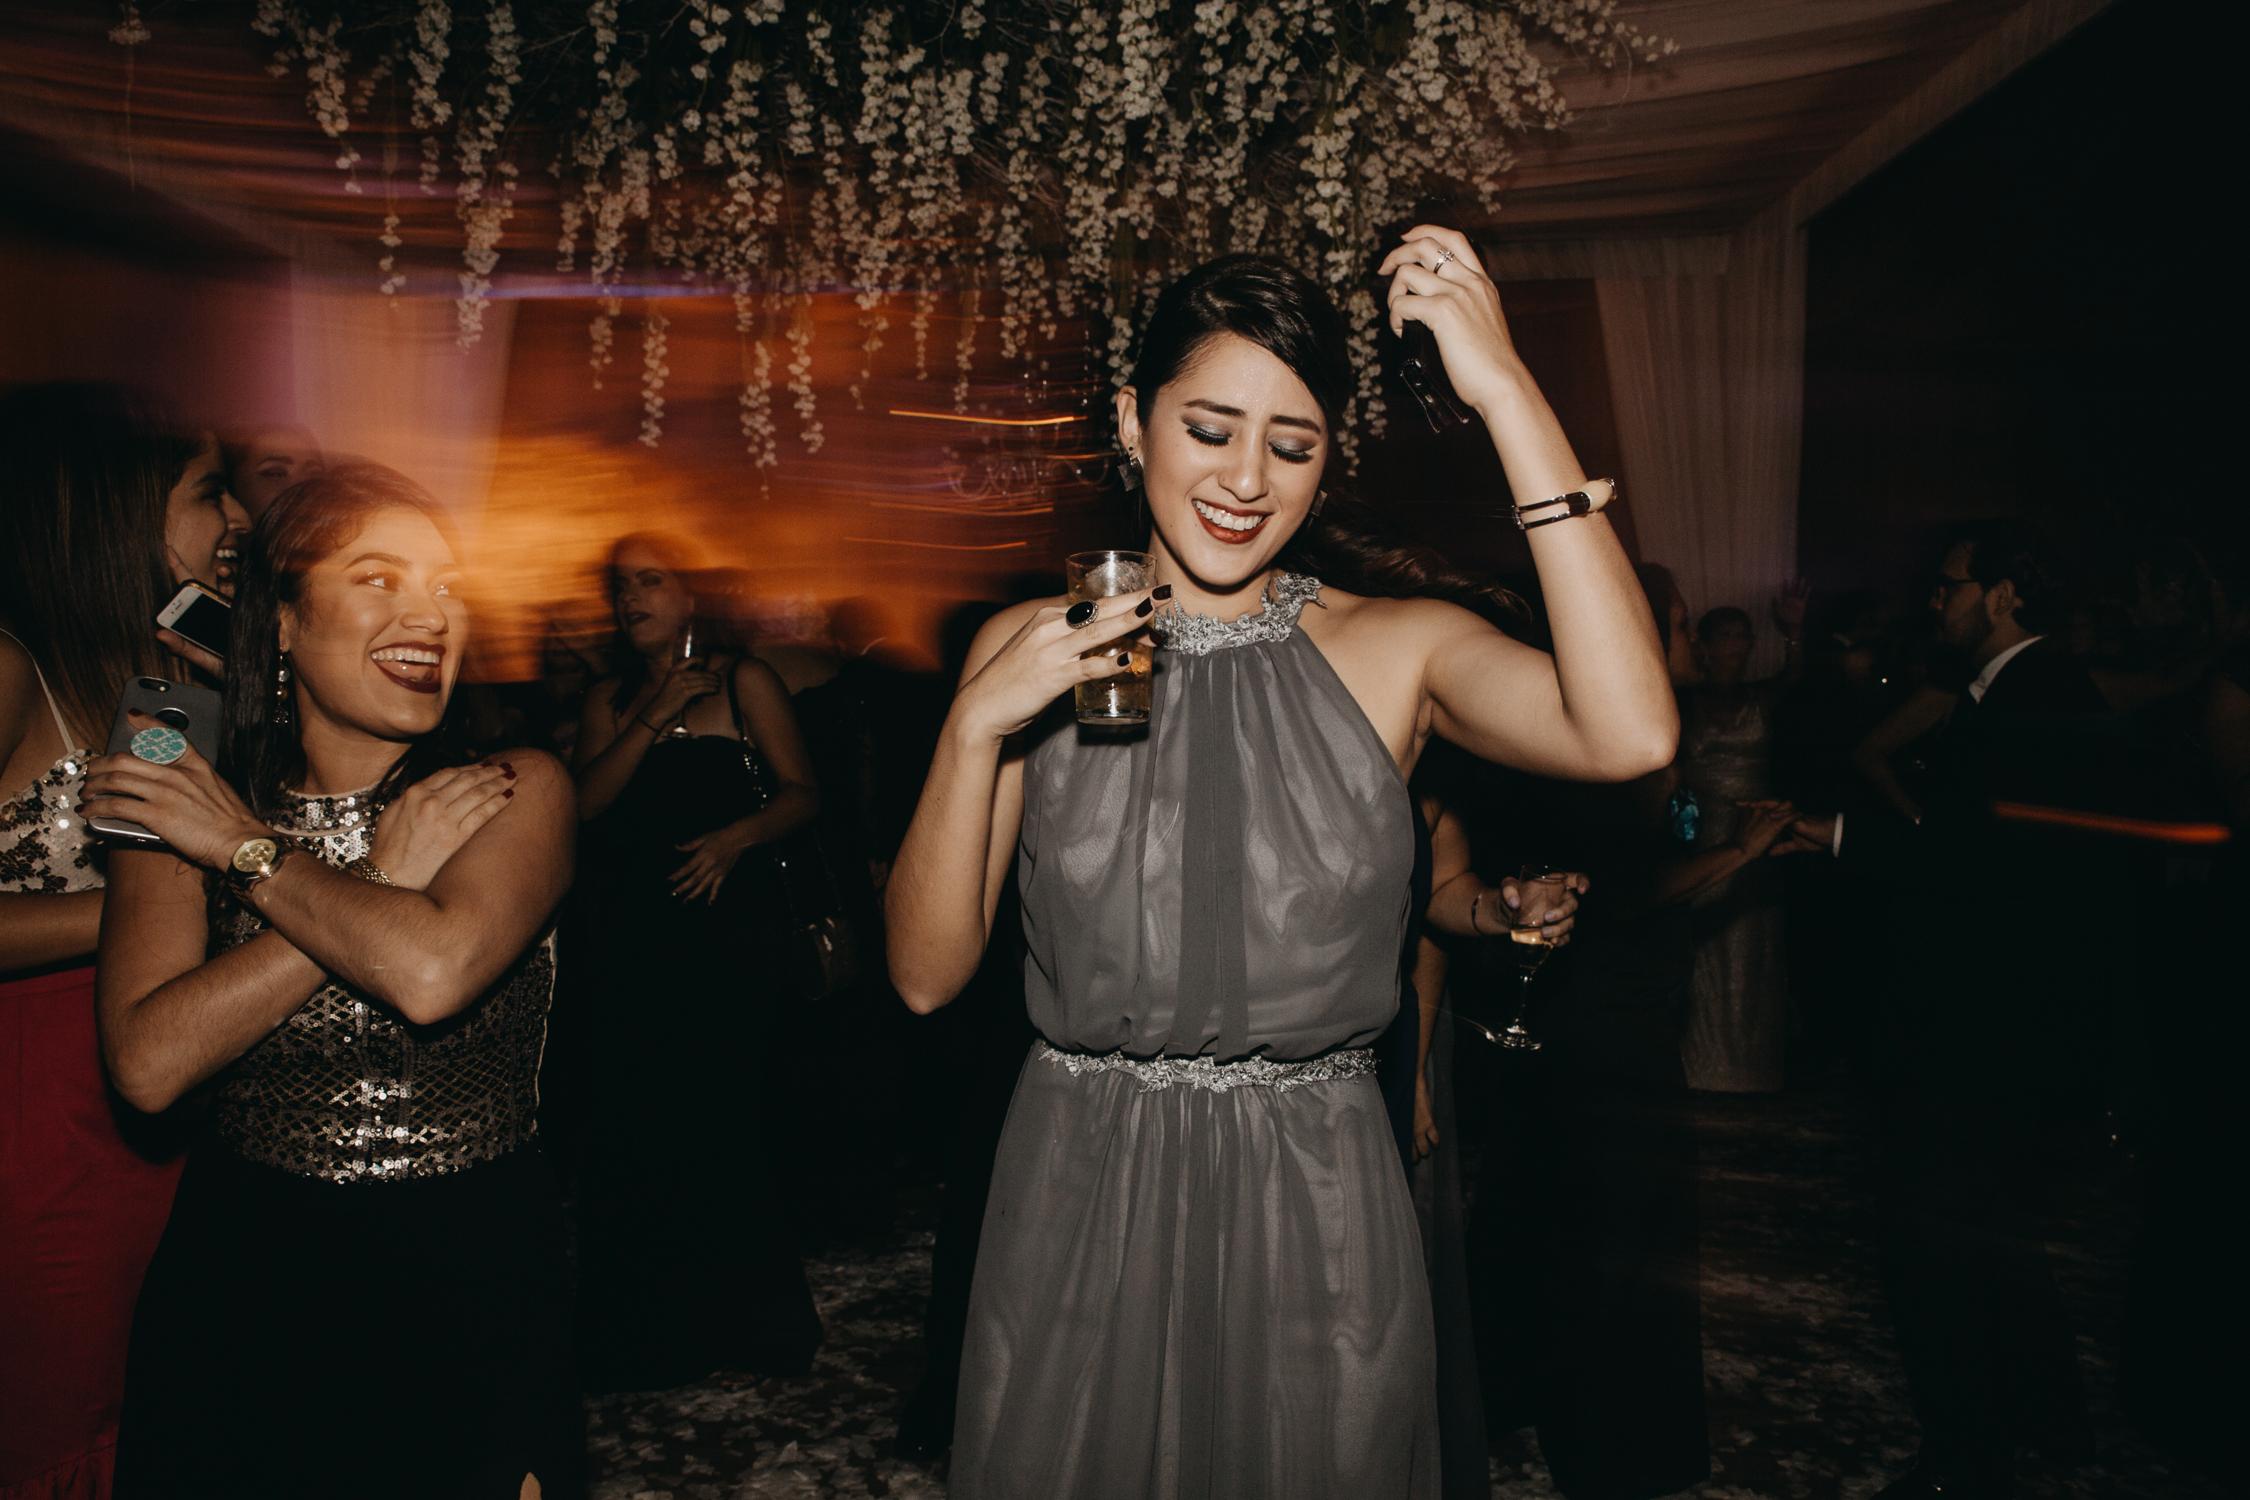 Michelle-Agurto-Fotografia-Bodas-Ecuador-Destination-Wedding-Photographer-Vicky-Javier-244.JPG